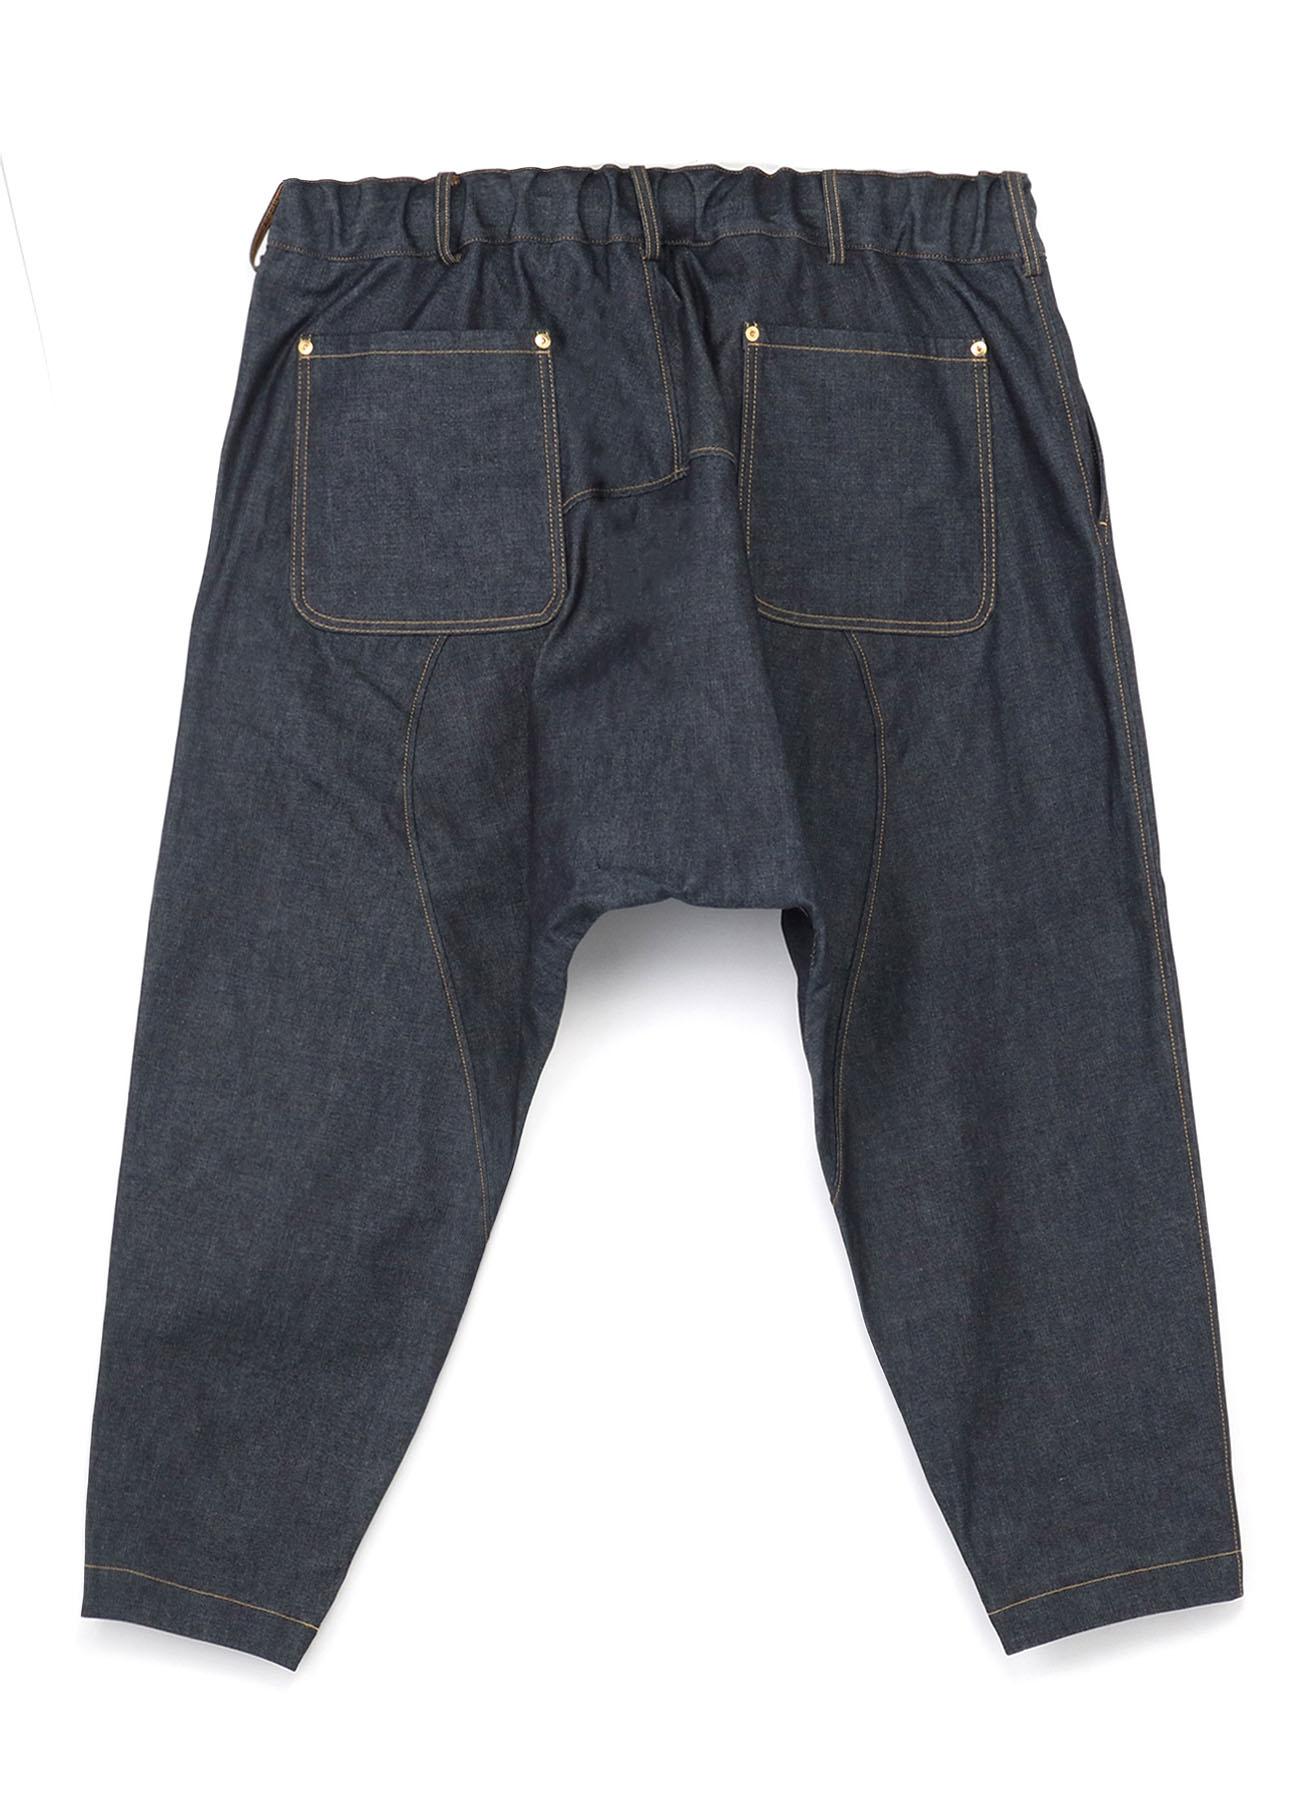 10 oz Denim Stitch Work Sarouel Tapered pants